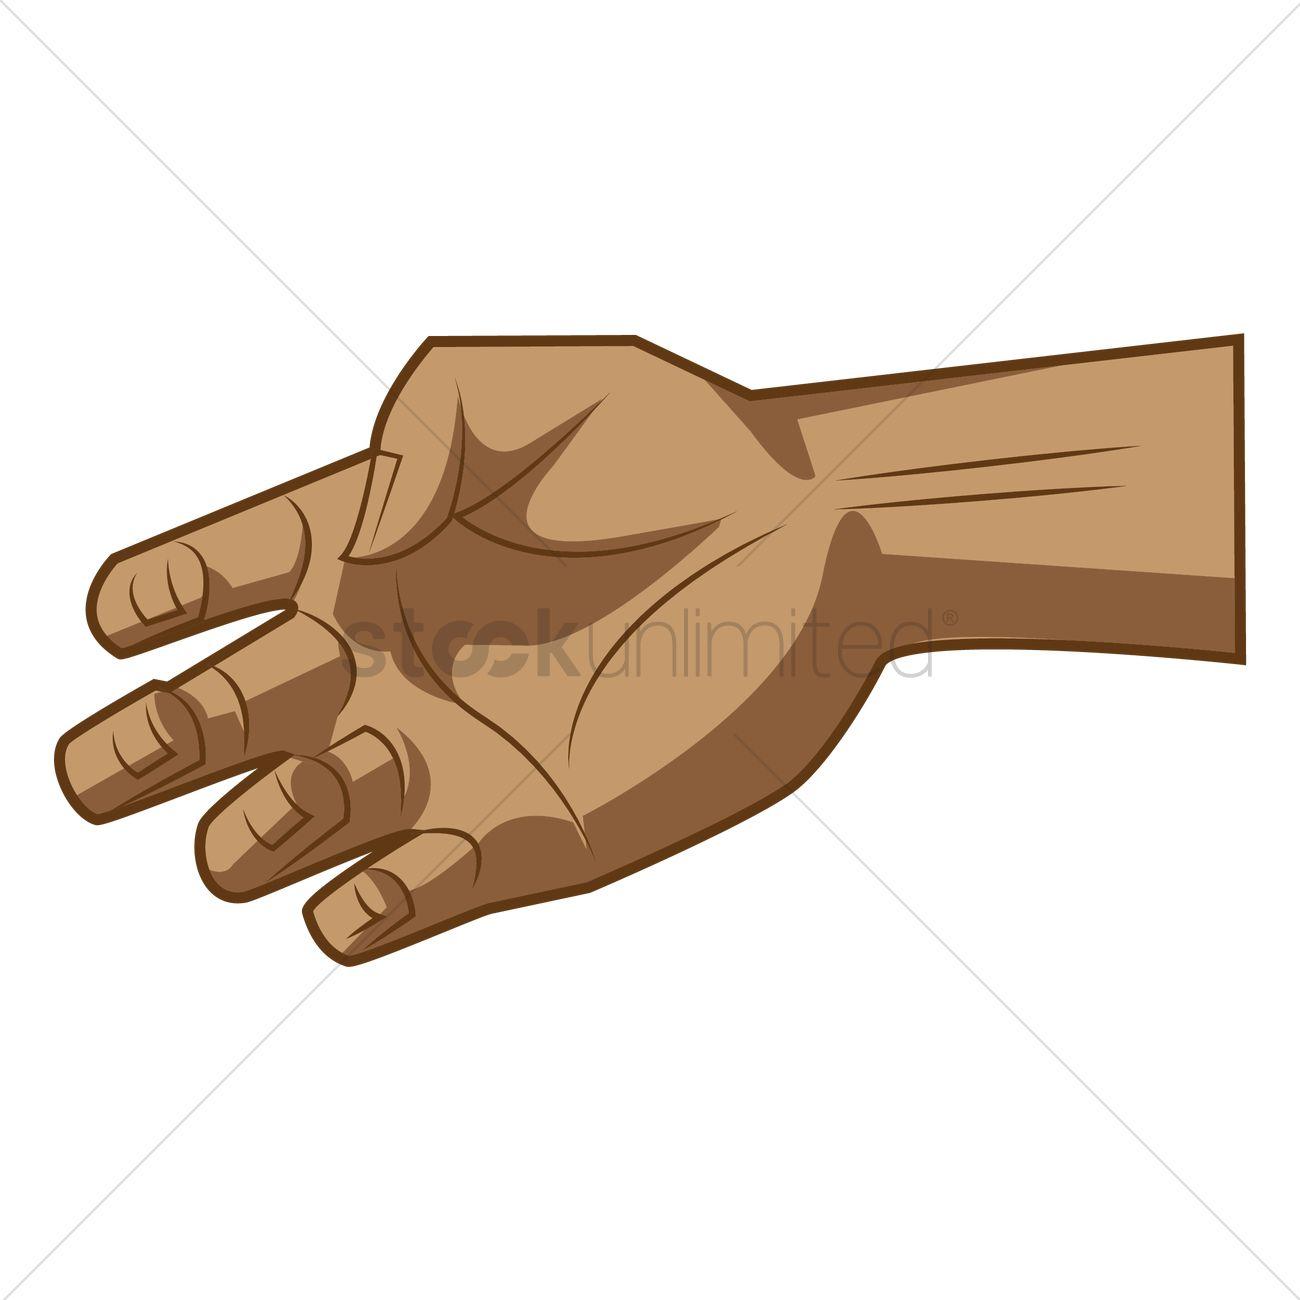 Grab hand Vector Image - 1459056 | StockUnlimited